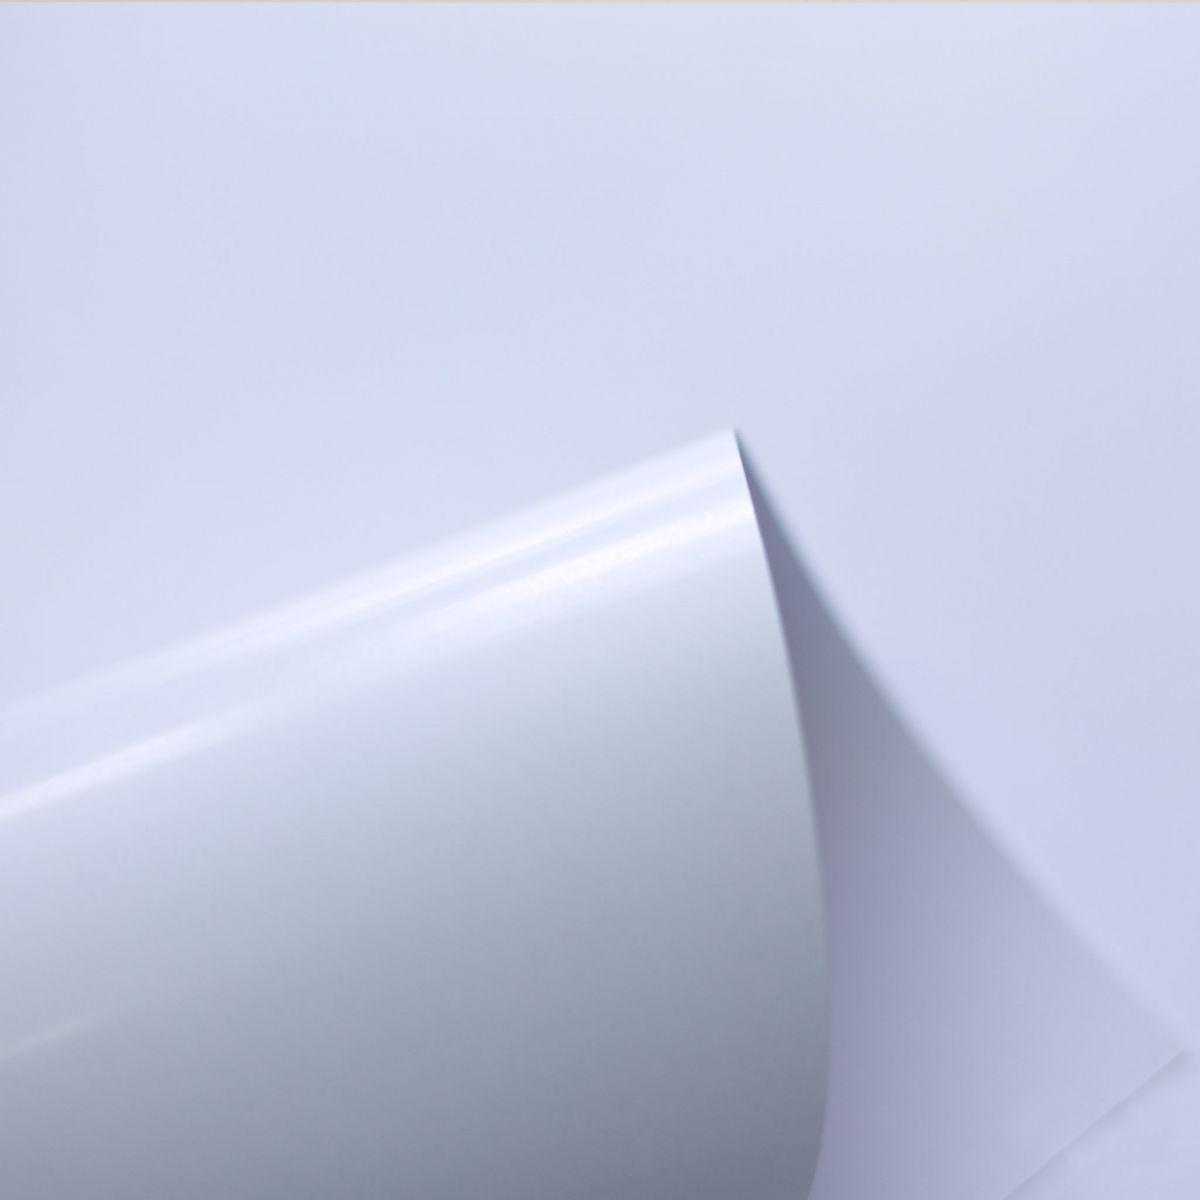 Papel Couche Brilho A4 170gm - 10 Folhas